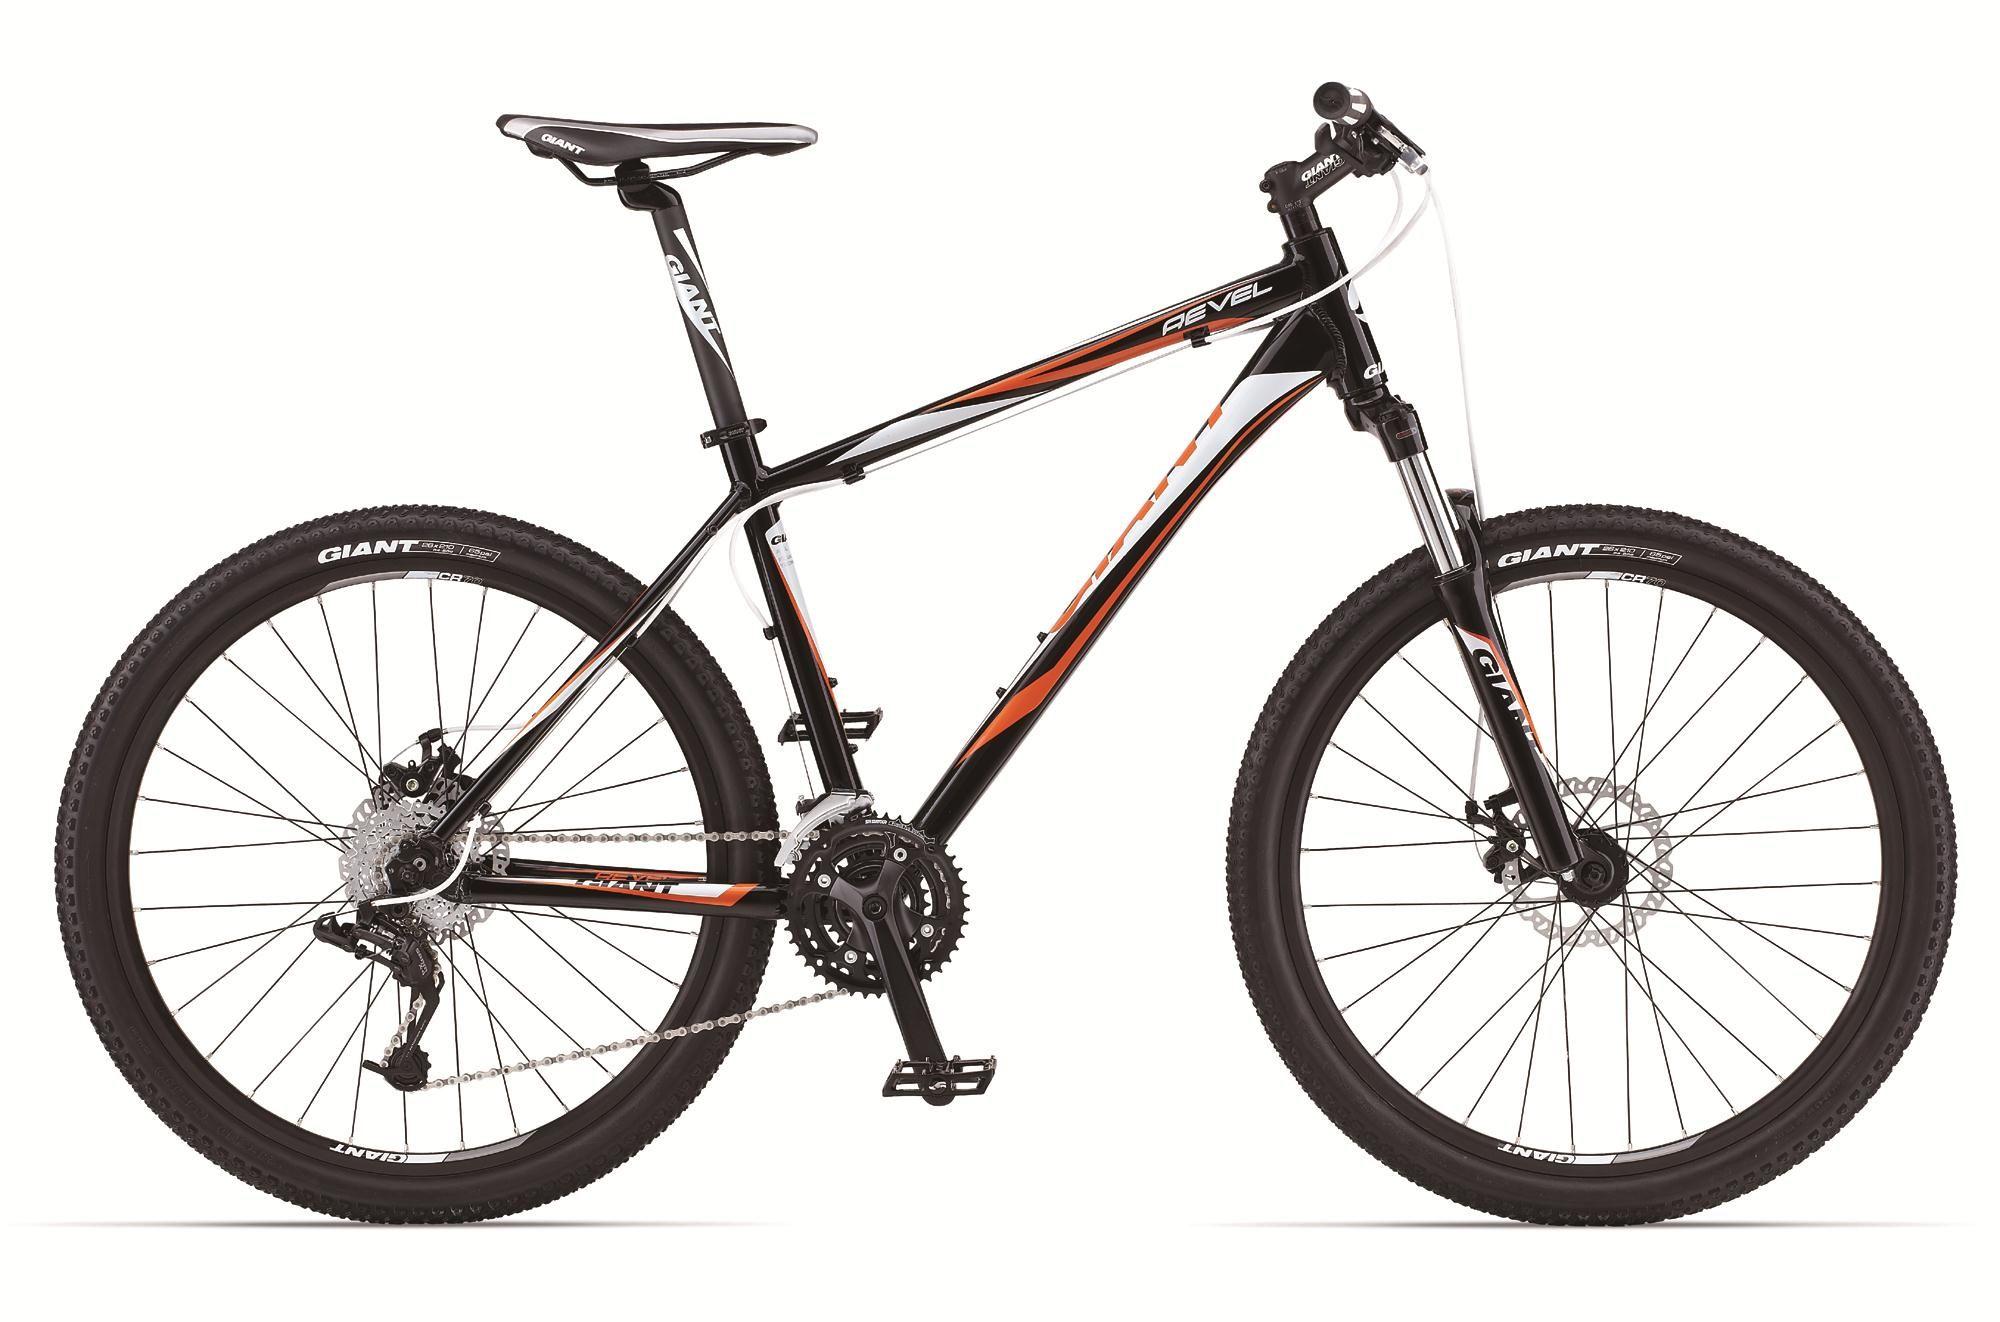 Revel 1 (2013) - Bikes | Giant Bicycles | United States | Bikes and ...